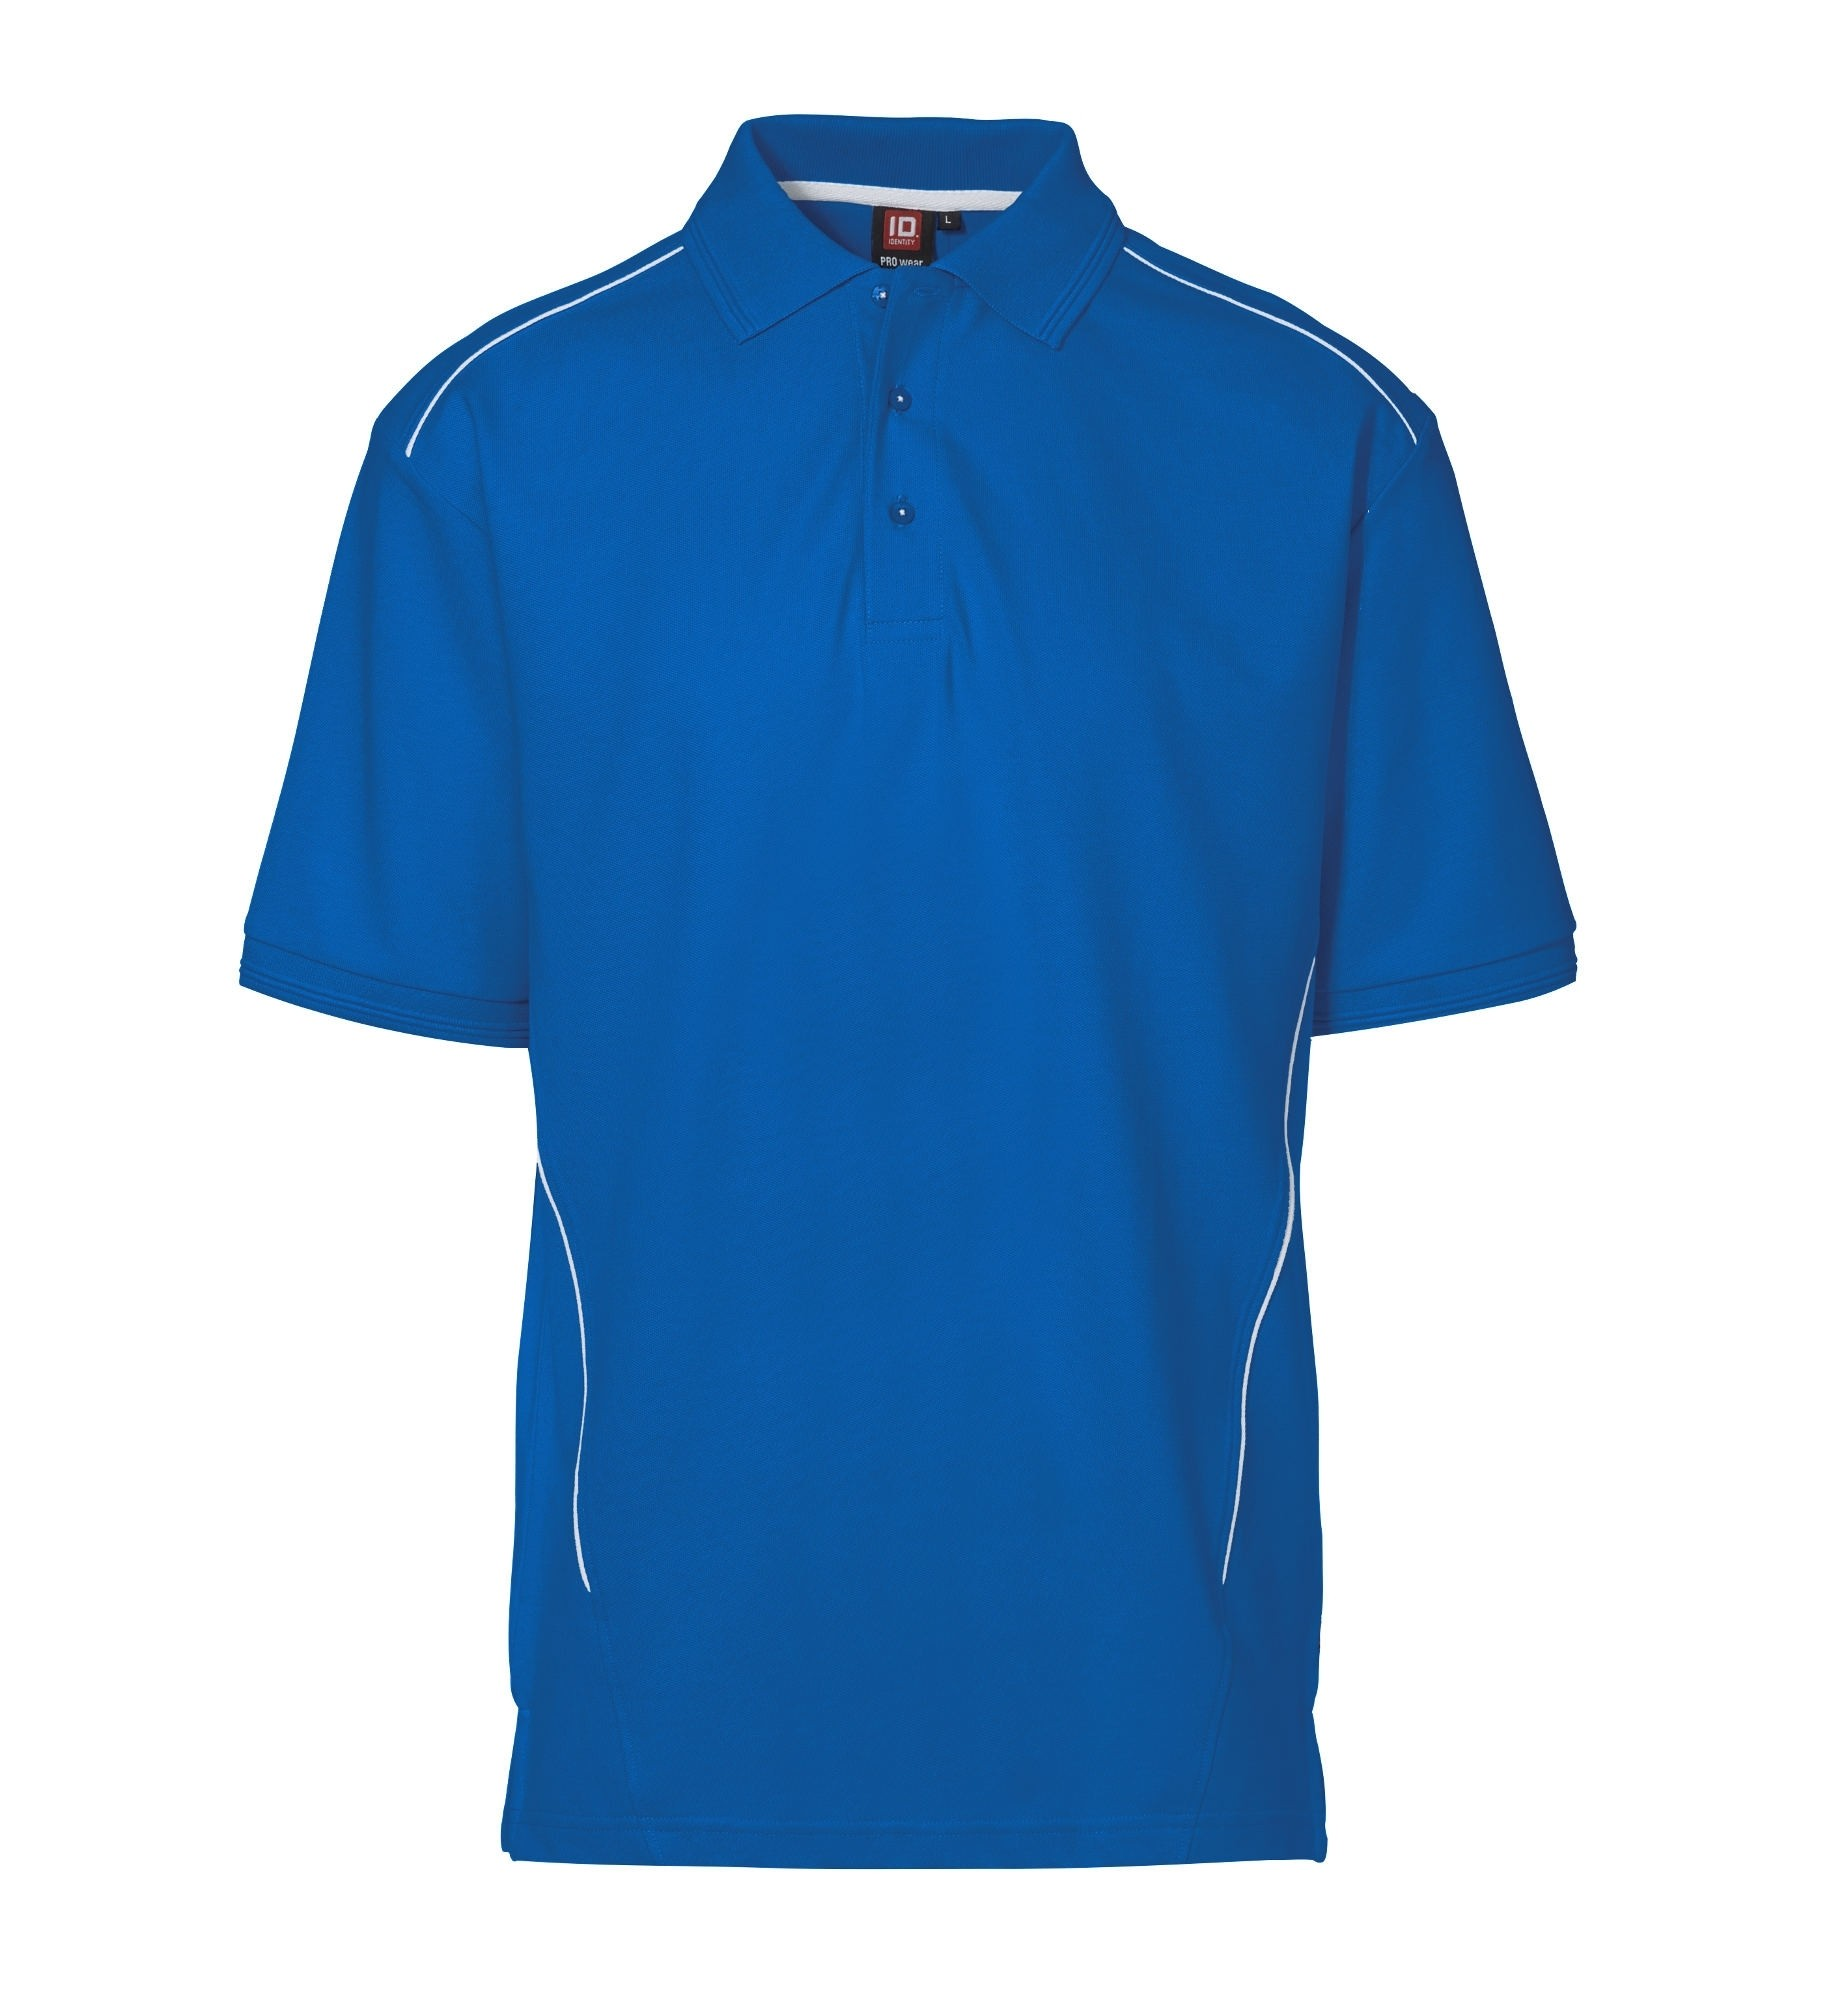 ID Poloshirt PRO Wear Herren